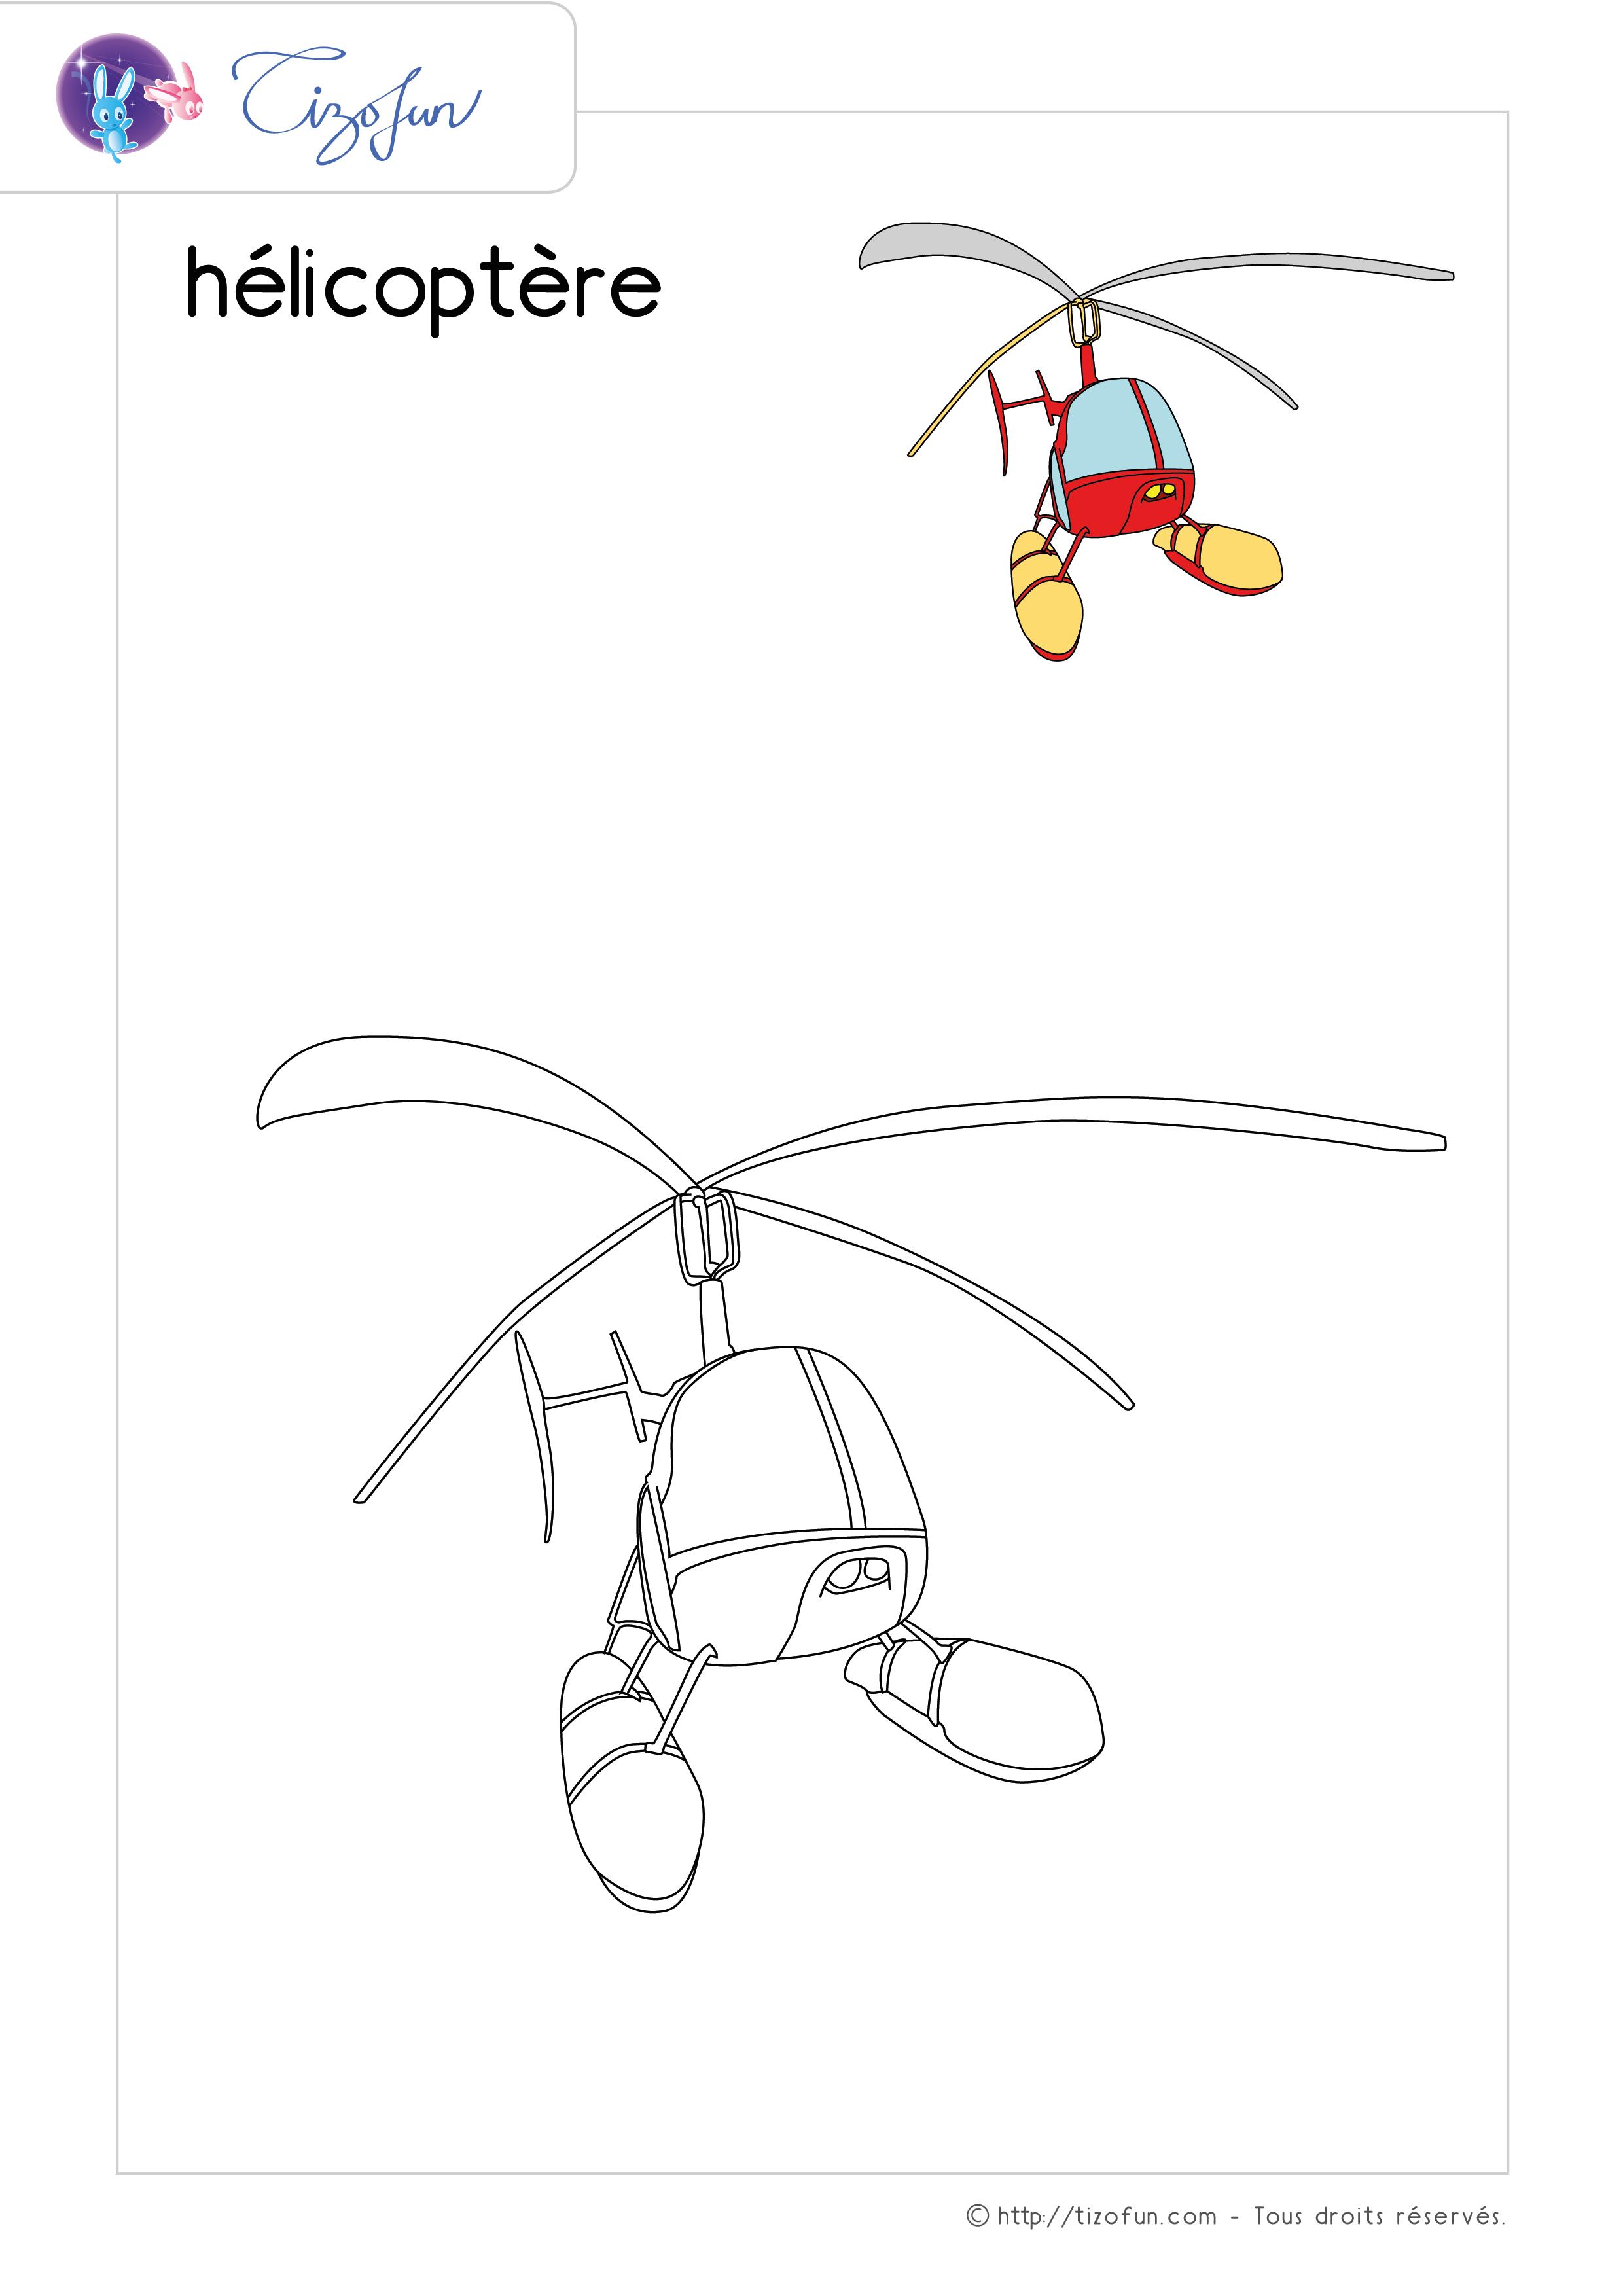 Coloriage Transport Dessin Helicoptere Coloriage Dessin Dessin